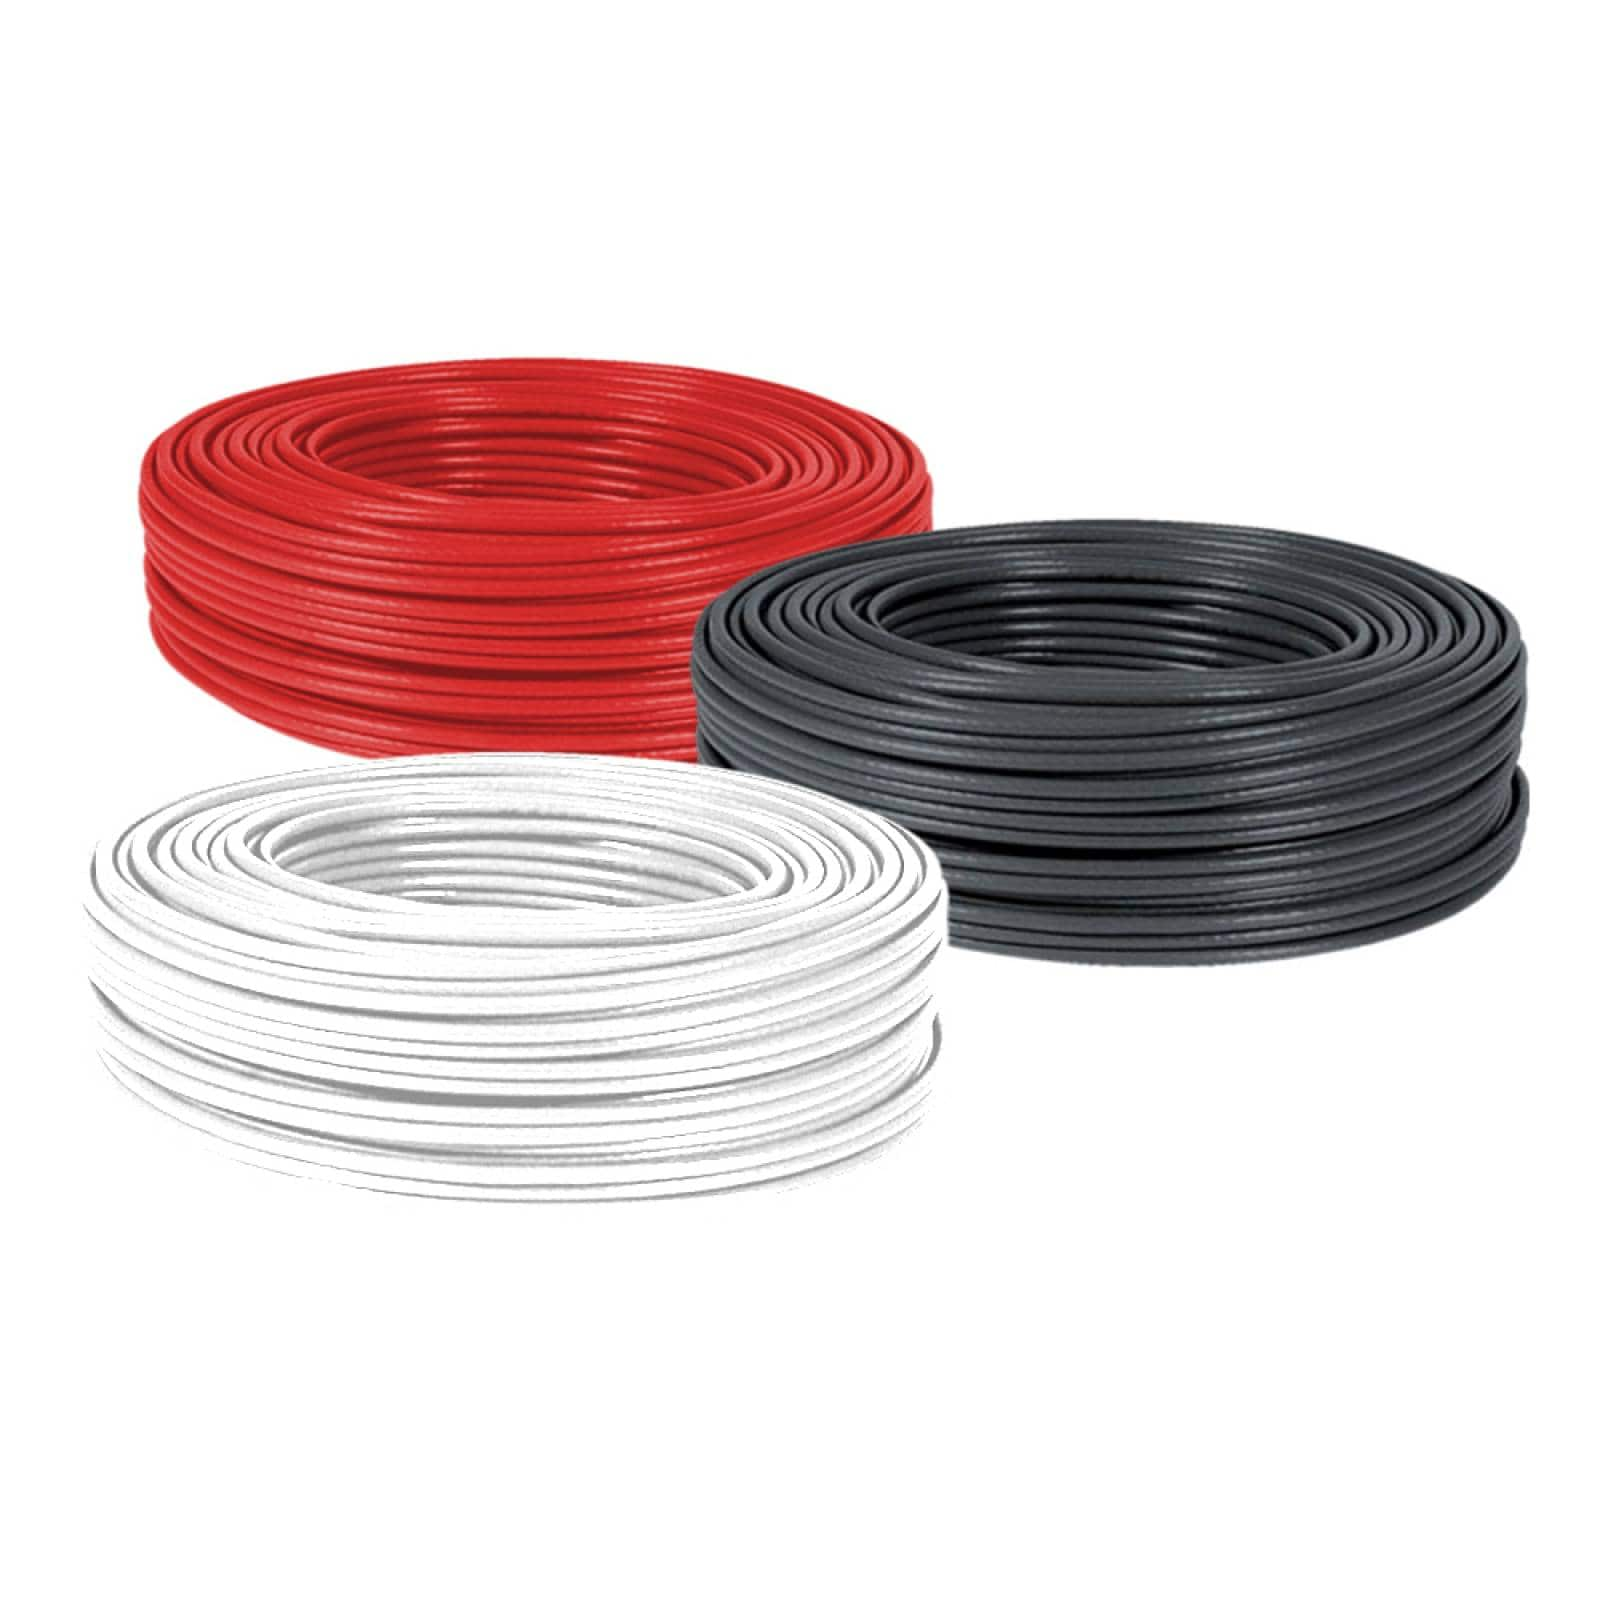 Kit Cables Electricos Thw Cobre Calibre 12 100M Adir